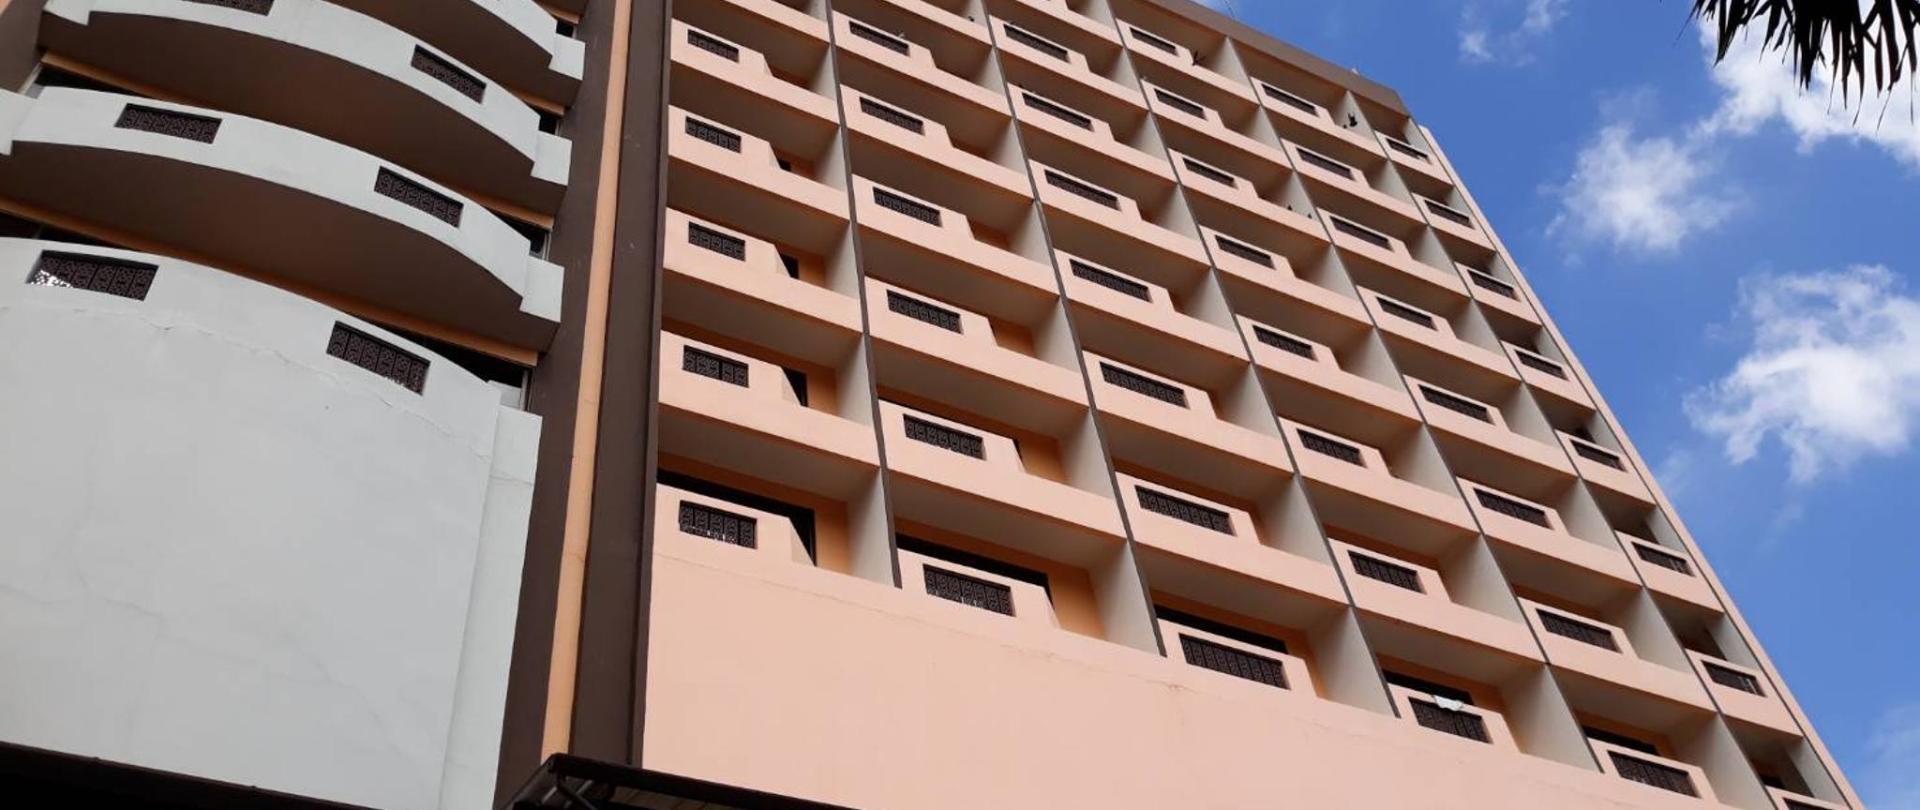 Edificio principal.jpg